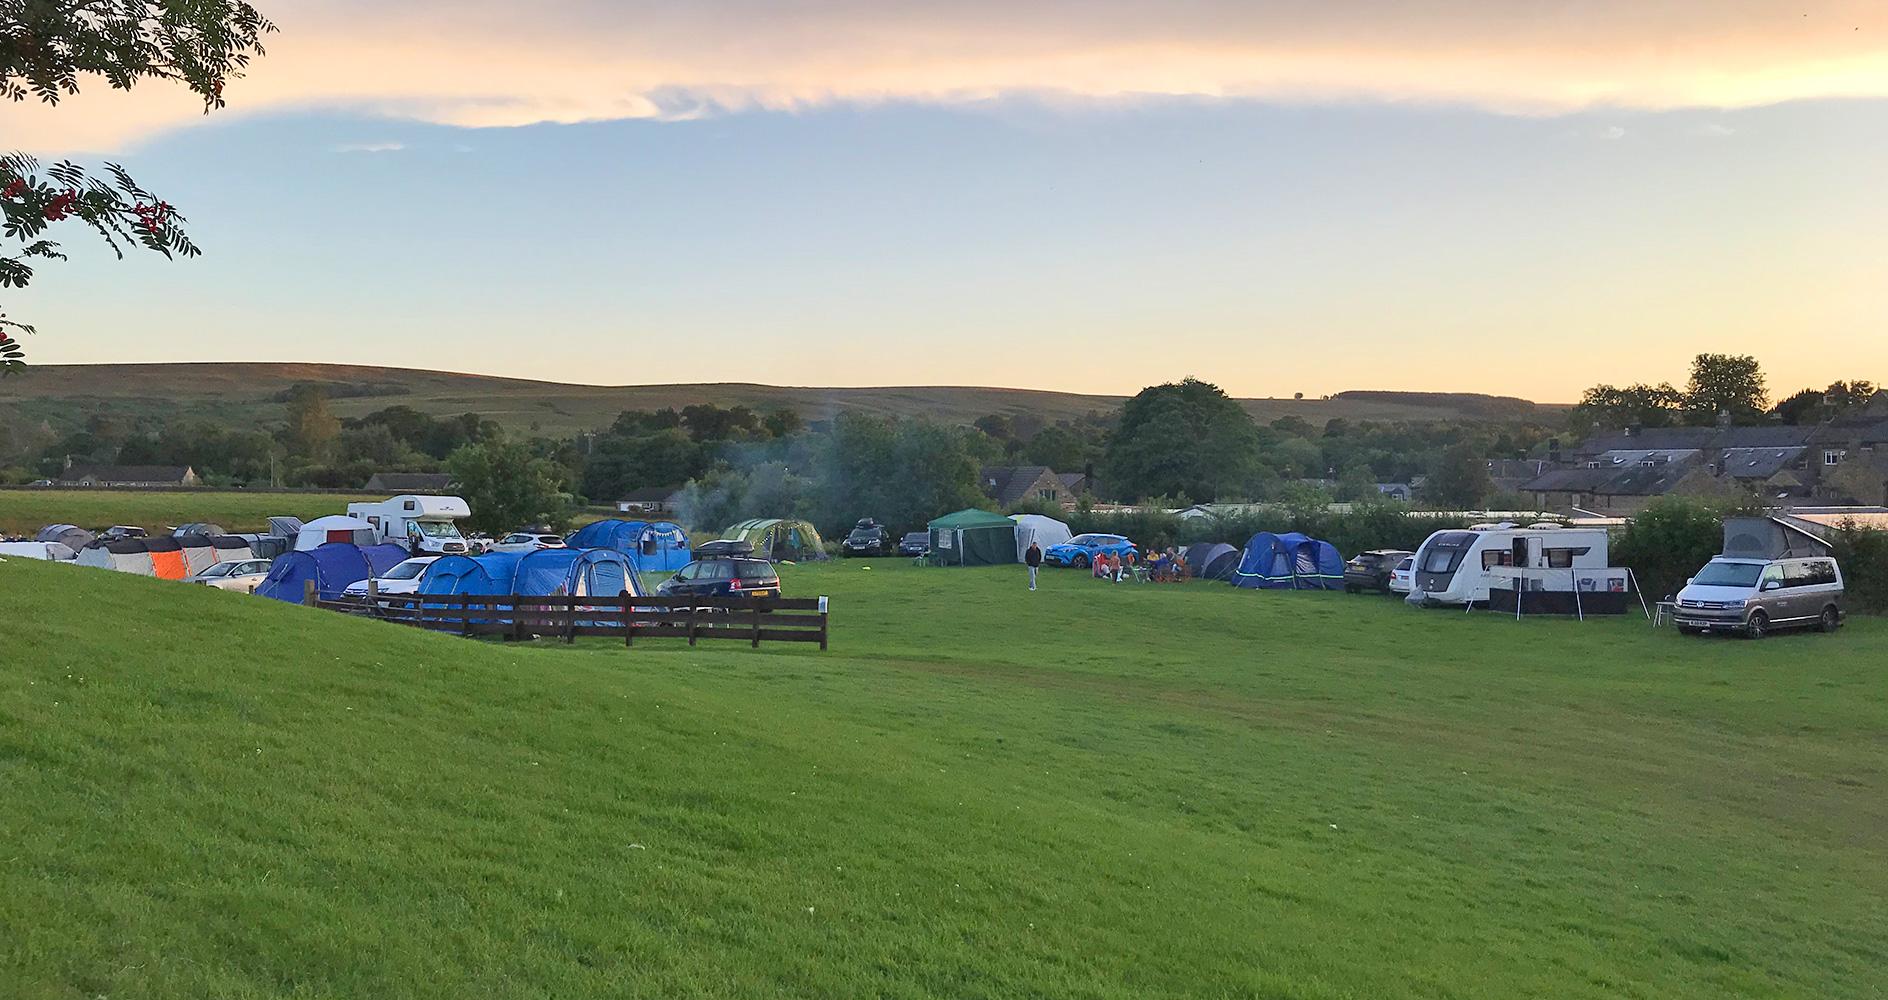 Demense Farm Campsite